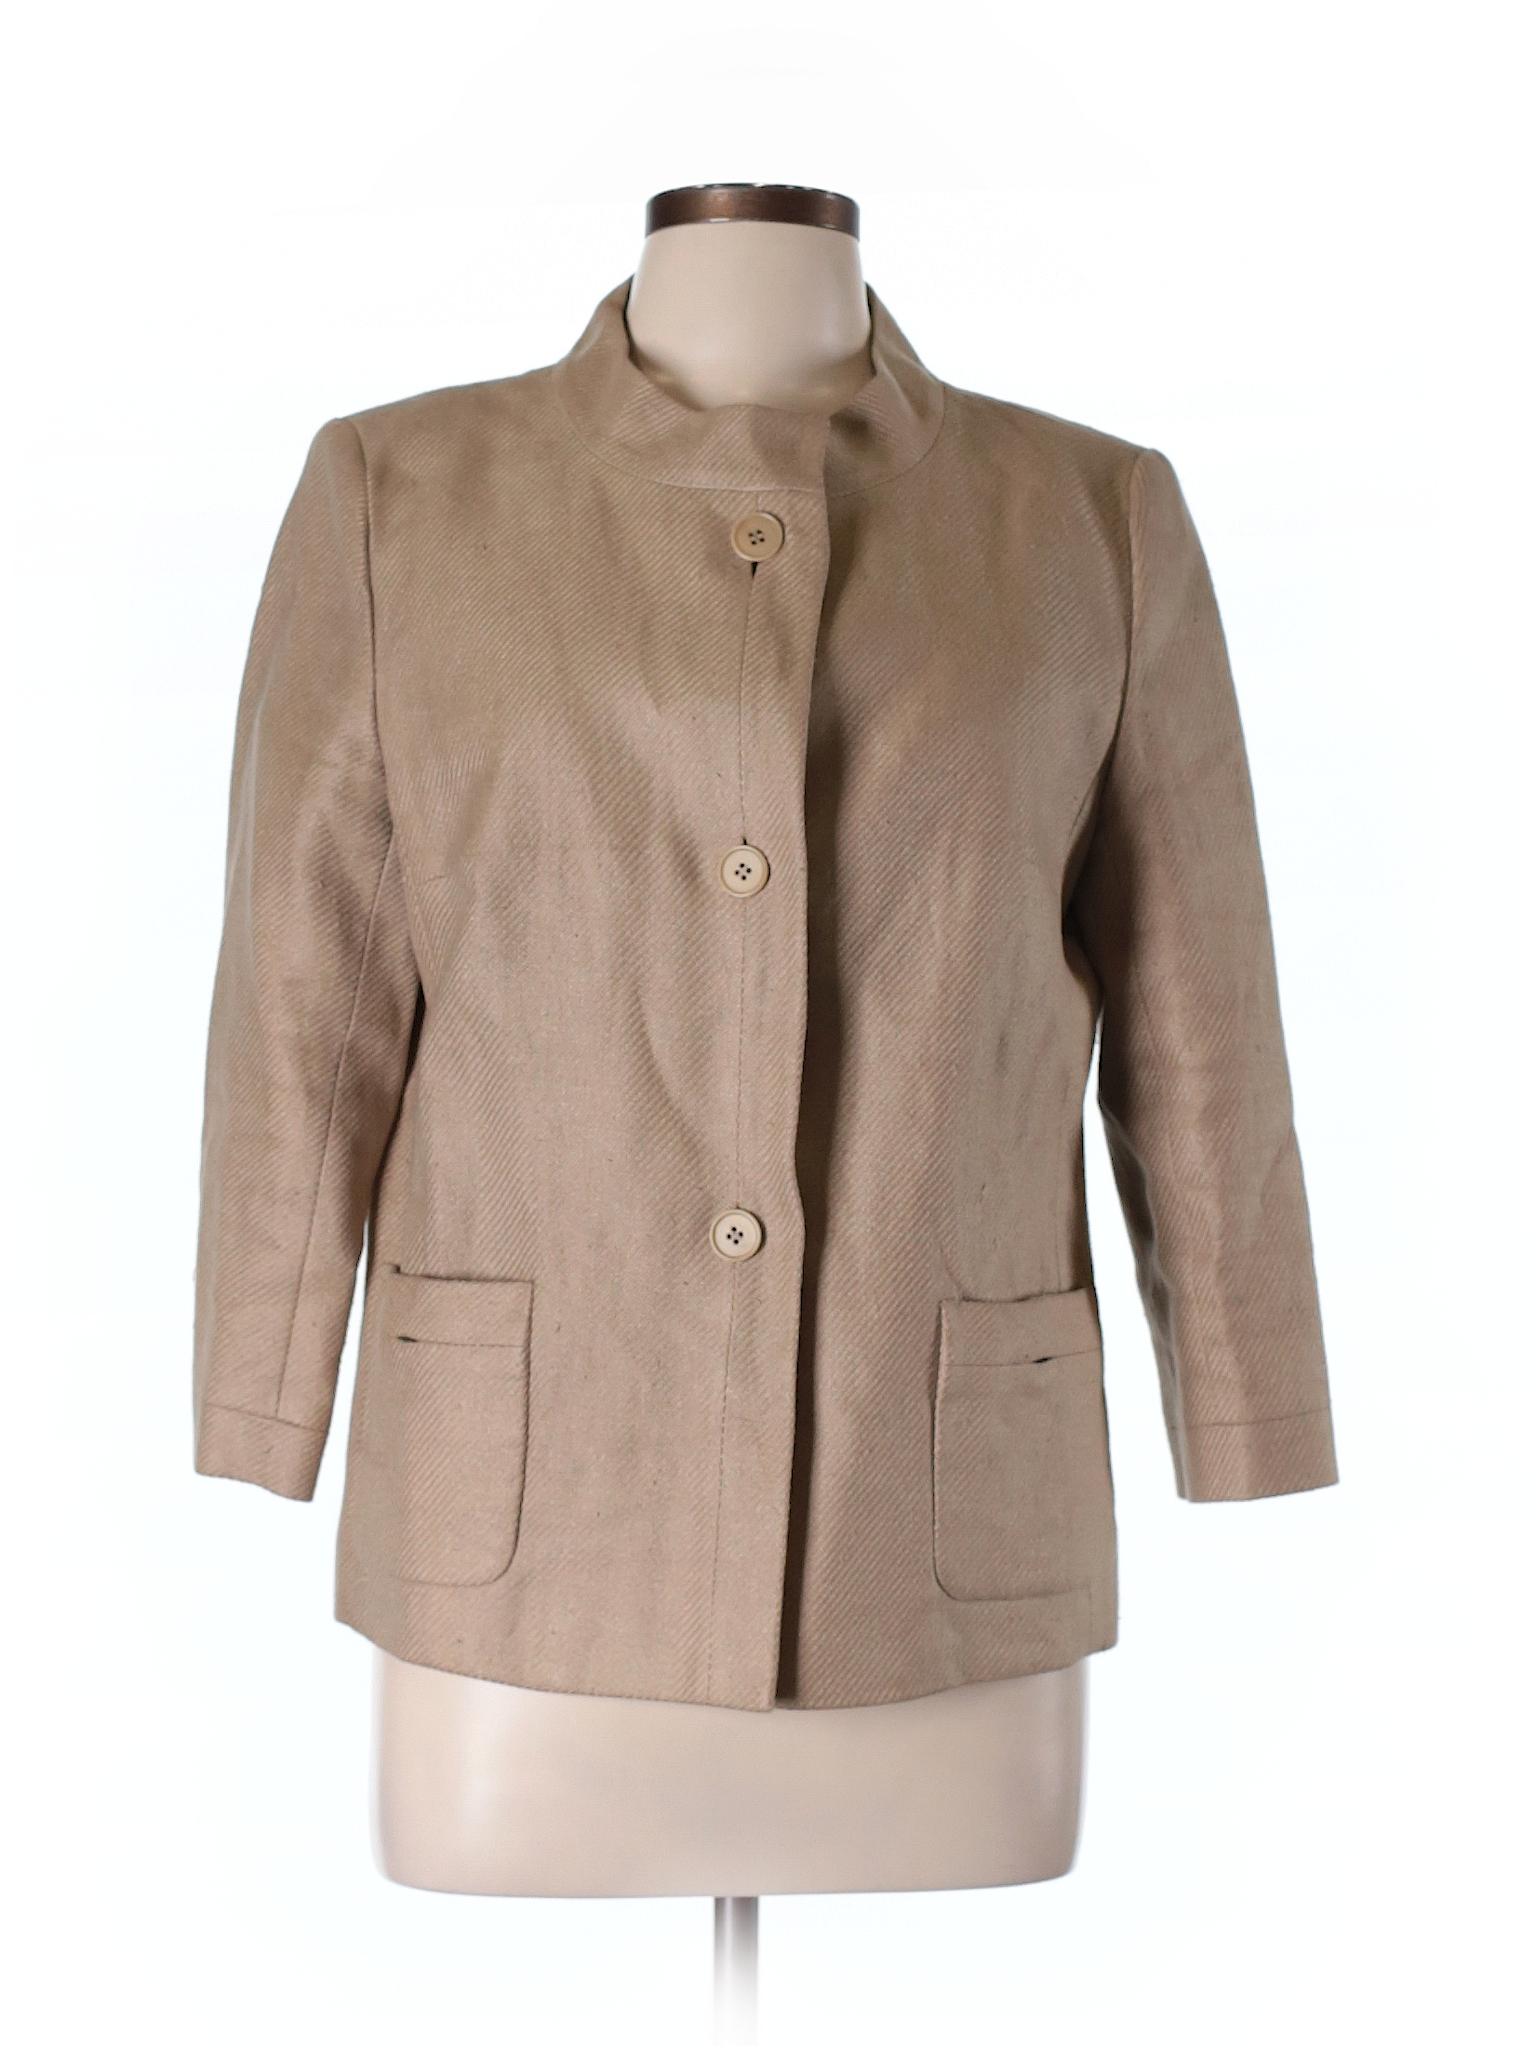 leisure Boutique Boutique leisure Jacket Talbots Rz6YqWRX74